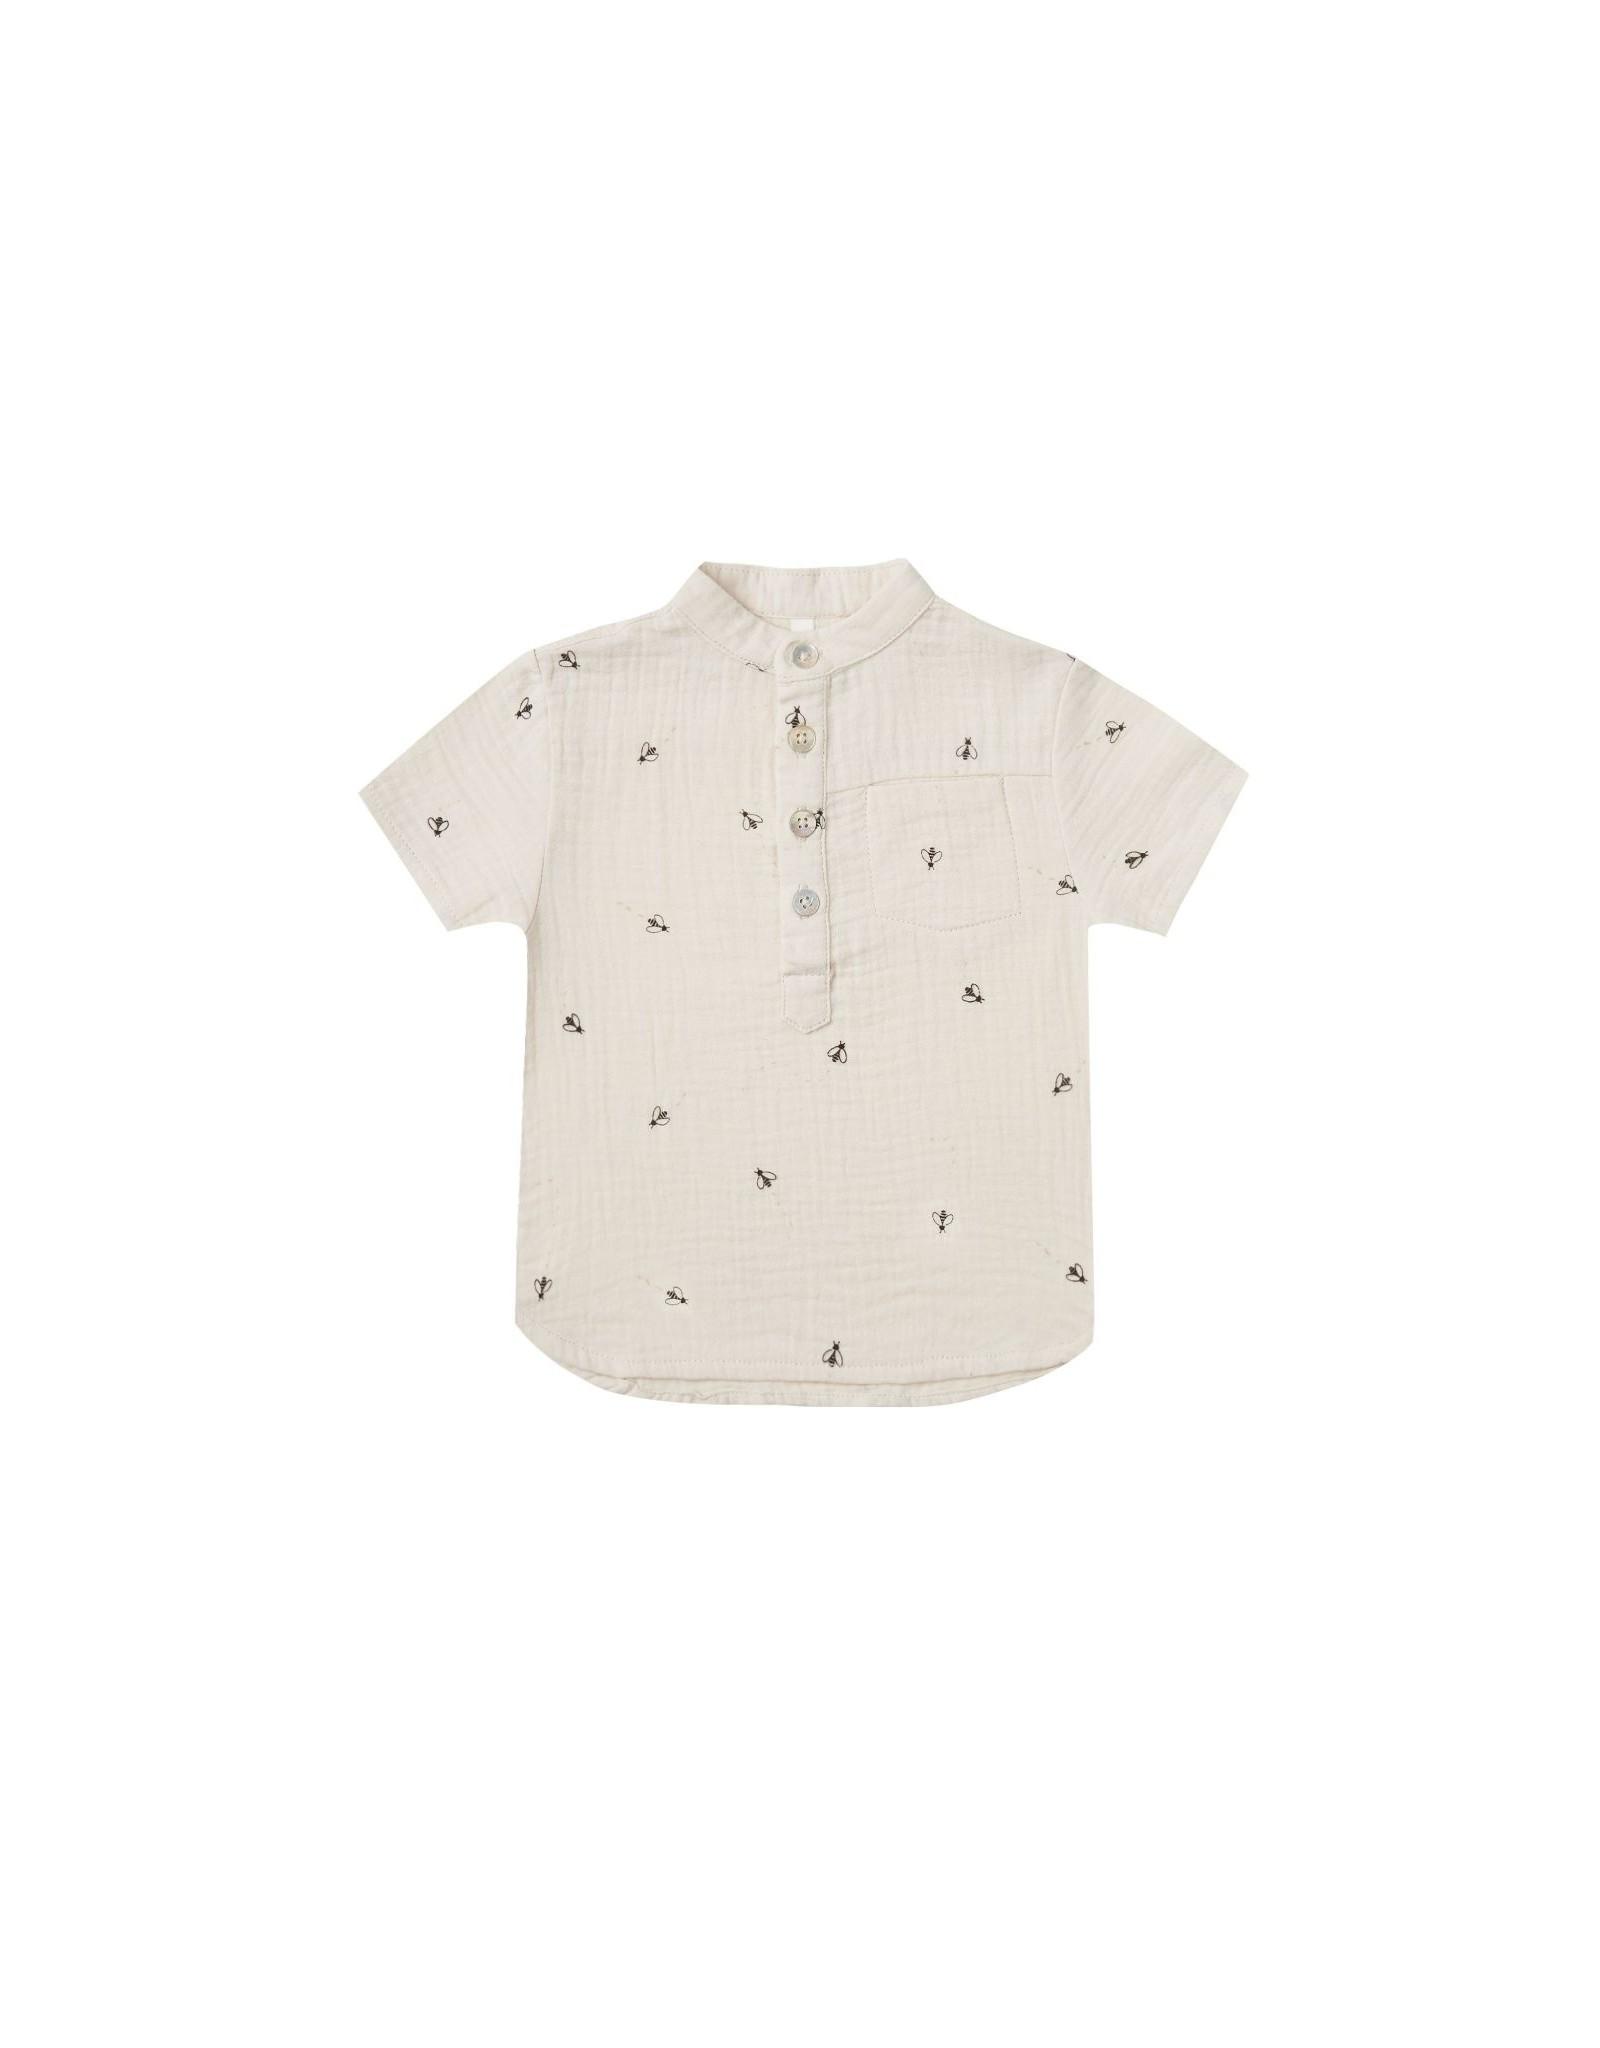 Rylee & Cru Rylee & Cru Bees Mason Shirt